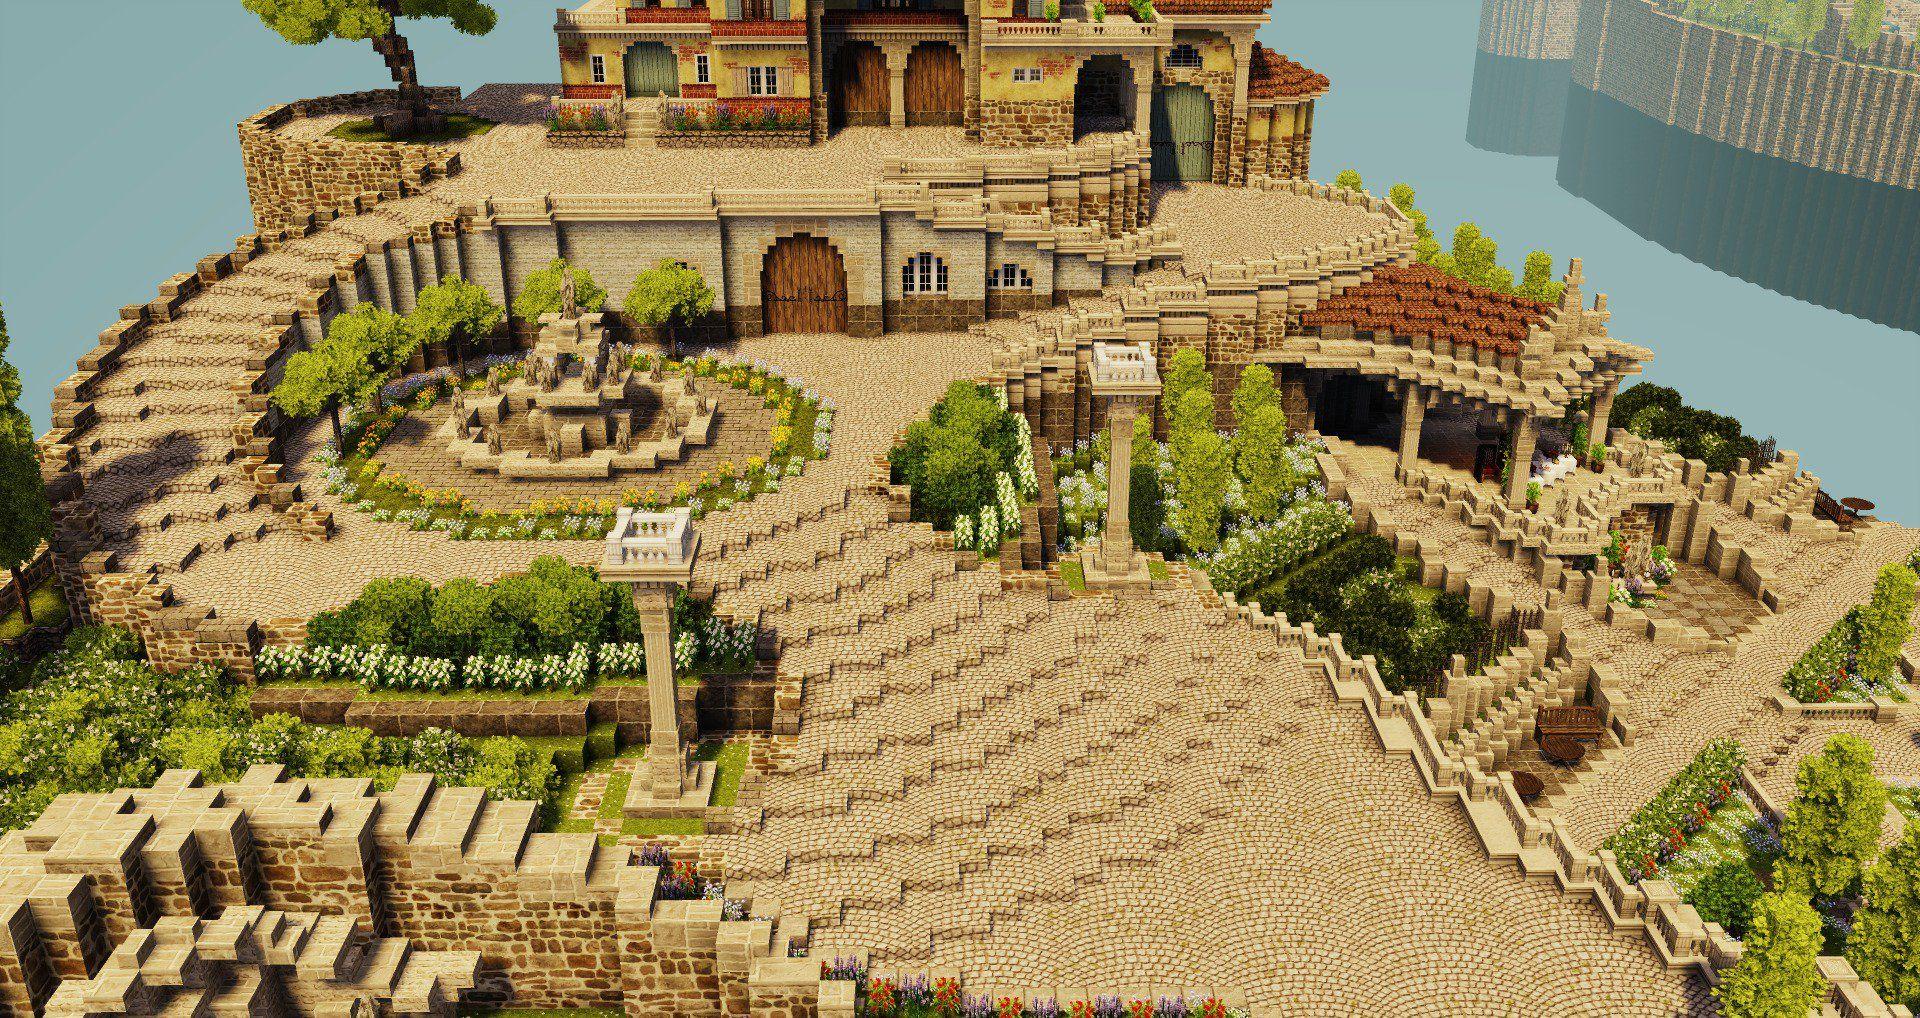 Dtzqnexvoae7cbe Jpg Large 1 920 1 018 Pixels Minecraft